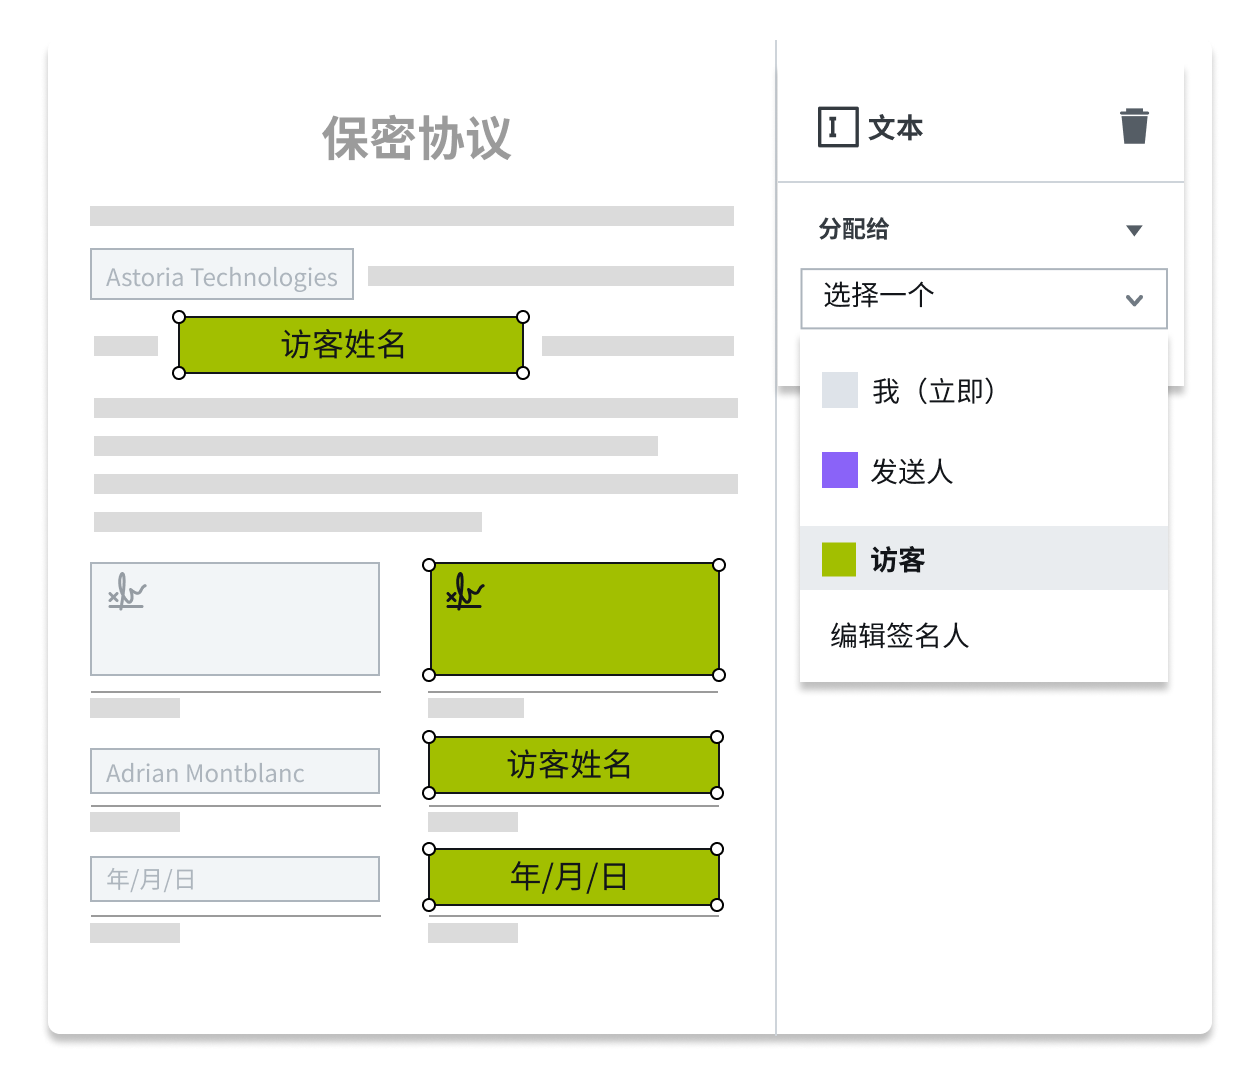 屏幕截图:用户在 HelloSign 中分配签名